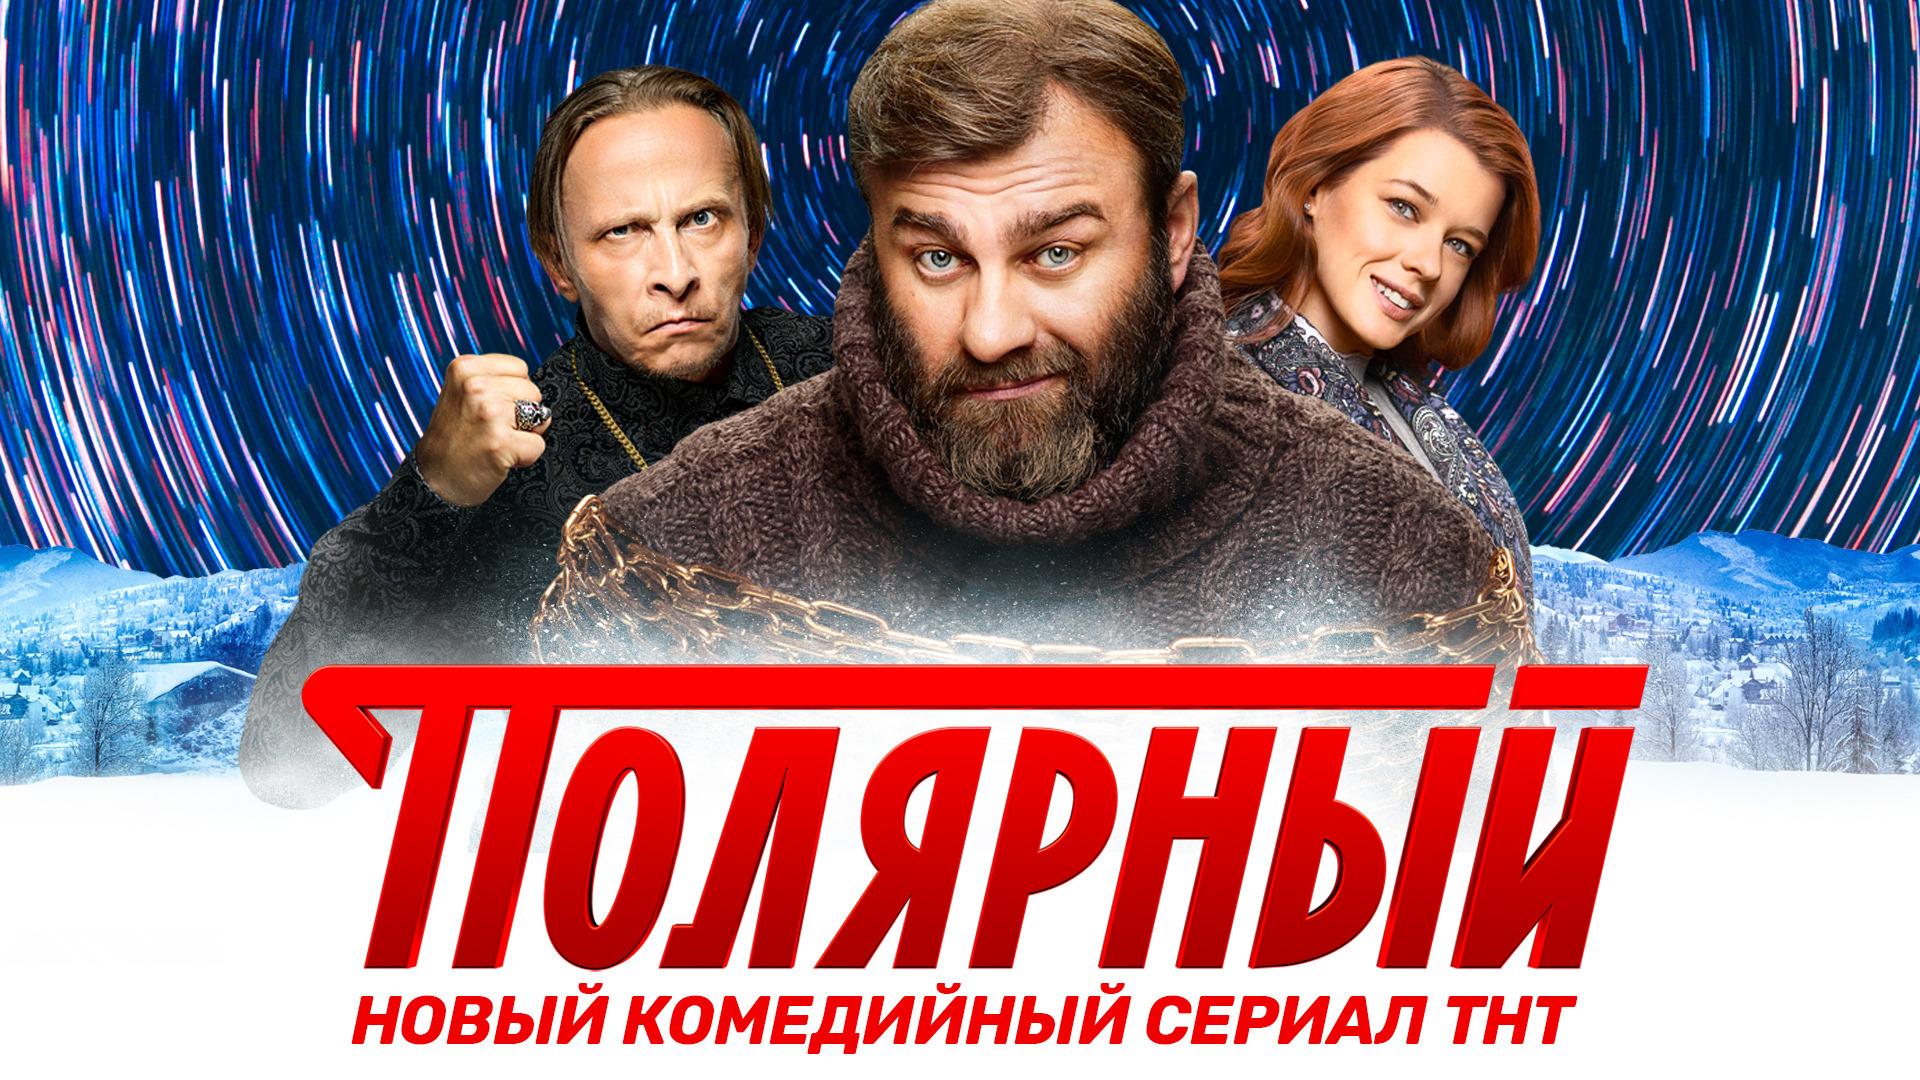 Show Полярный